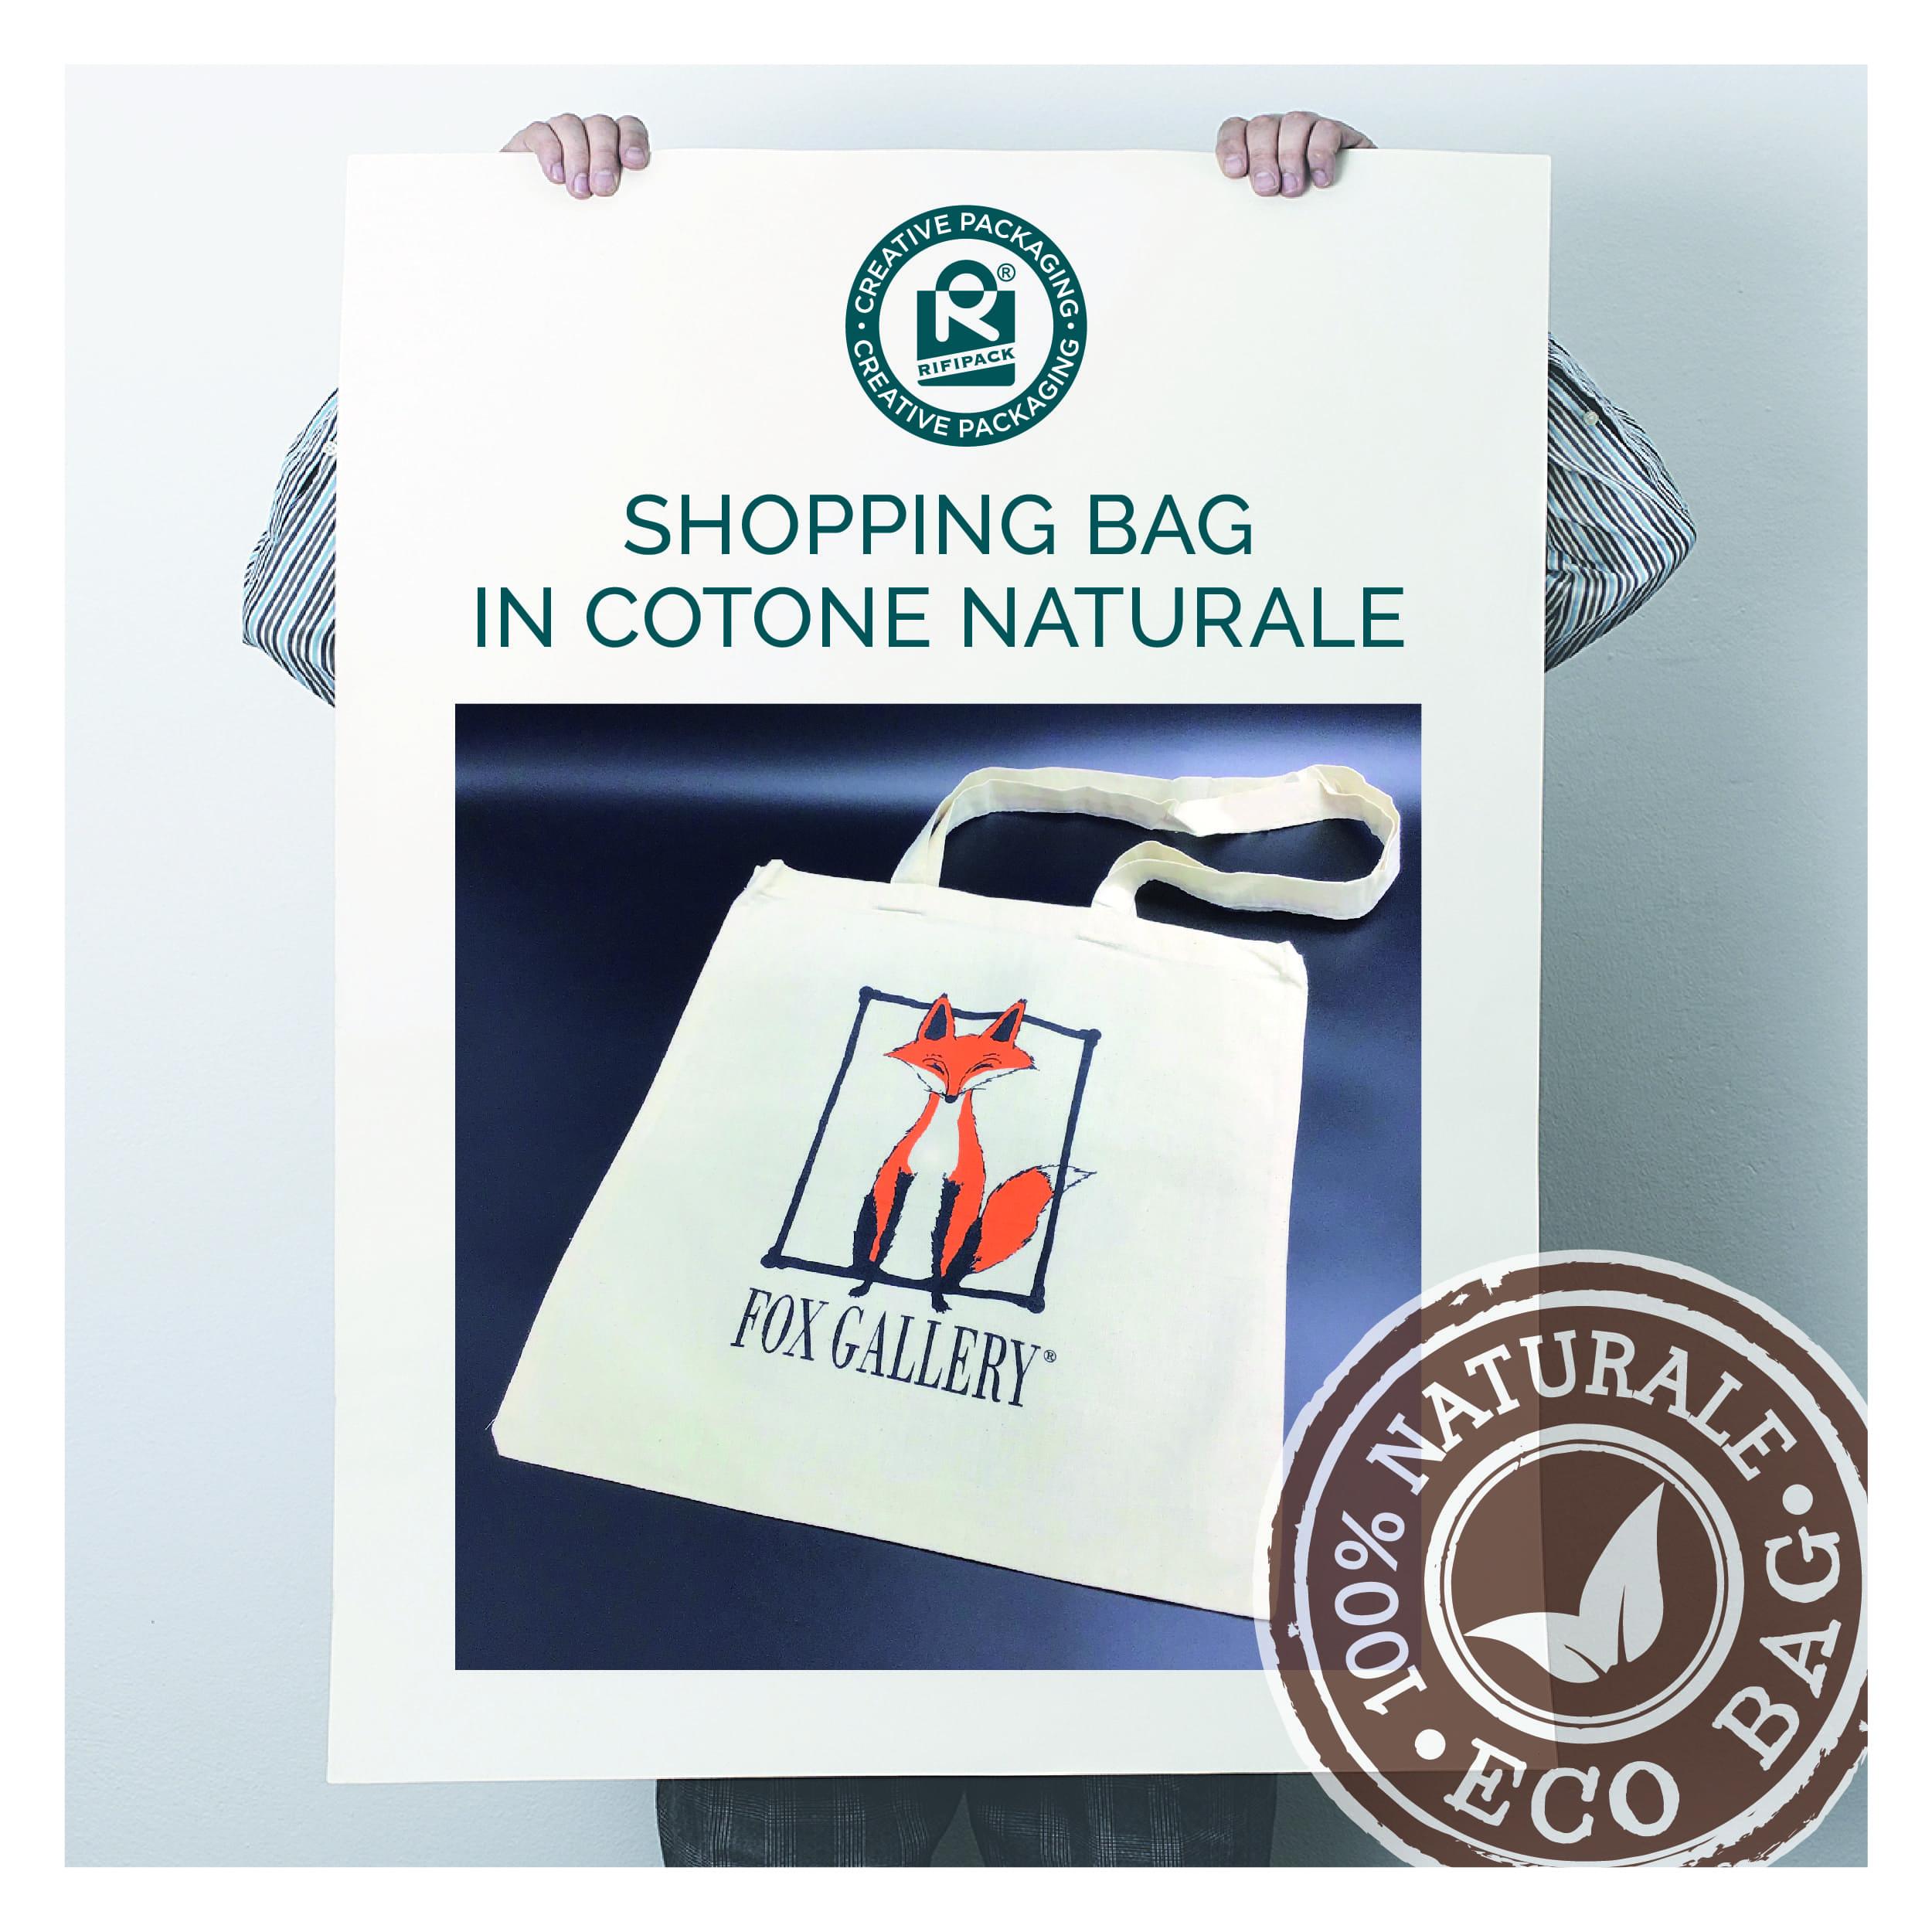 rifipack shopping bag shopper borse sportine in cotone naturale eco bag naturale